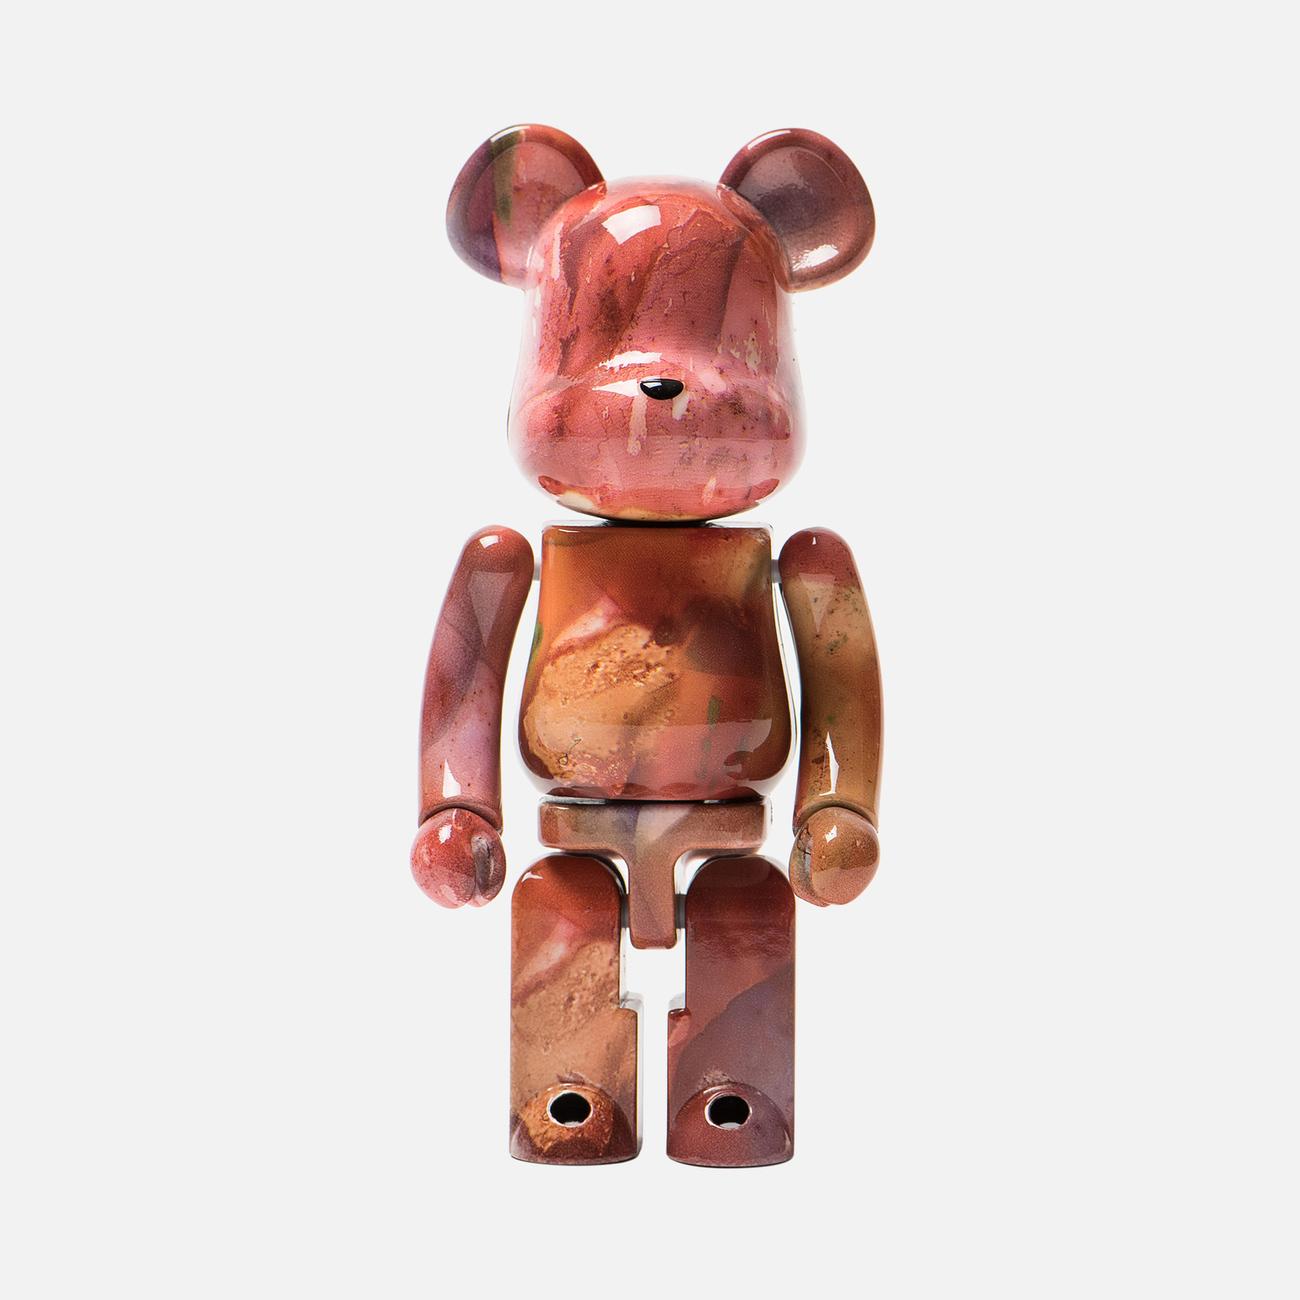 Игрушка Medicom Toy Bearbrick Super Alloyed Pushead 200%